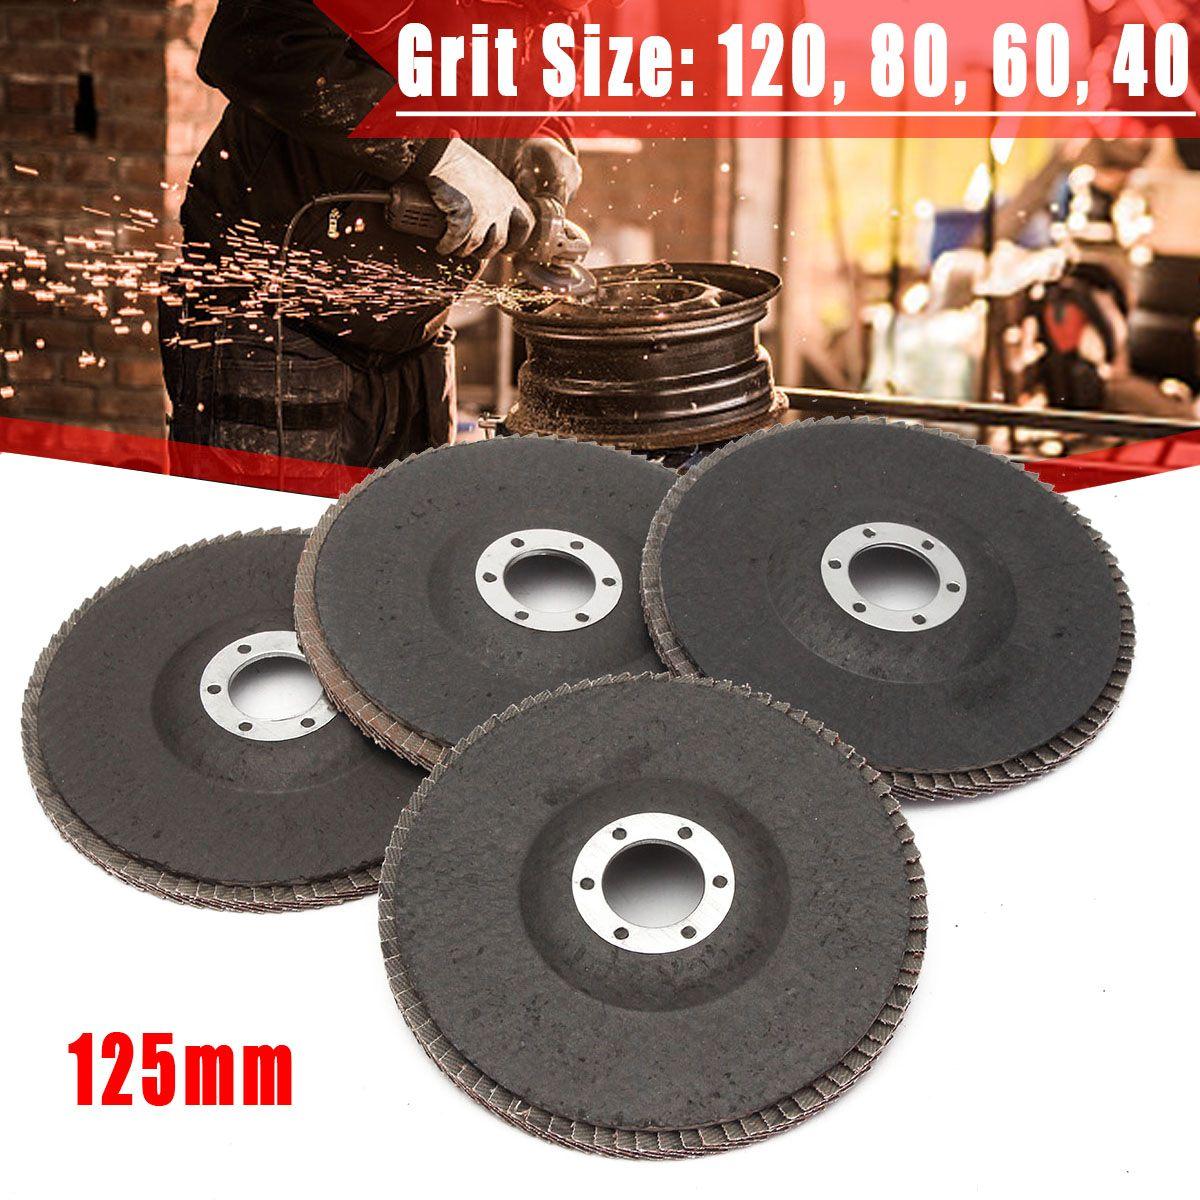 13000 Rpm Aluminum Oxide Abrasive Tools 40/60/80/120 Grit Grinding Wheel Flap Disc 125mm 5 Inch Angle Grinder Sanding Tool